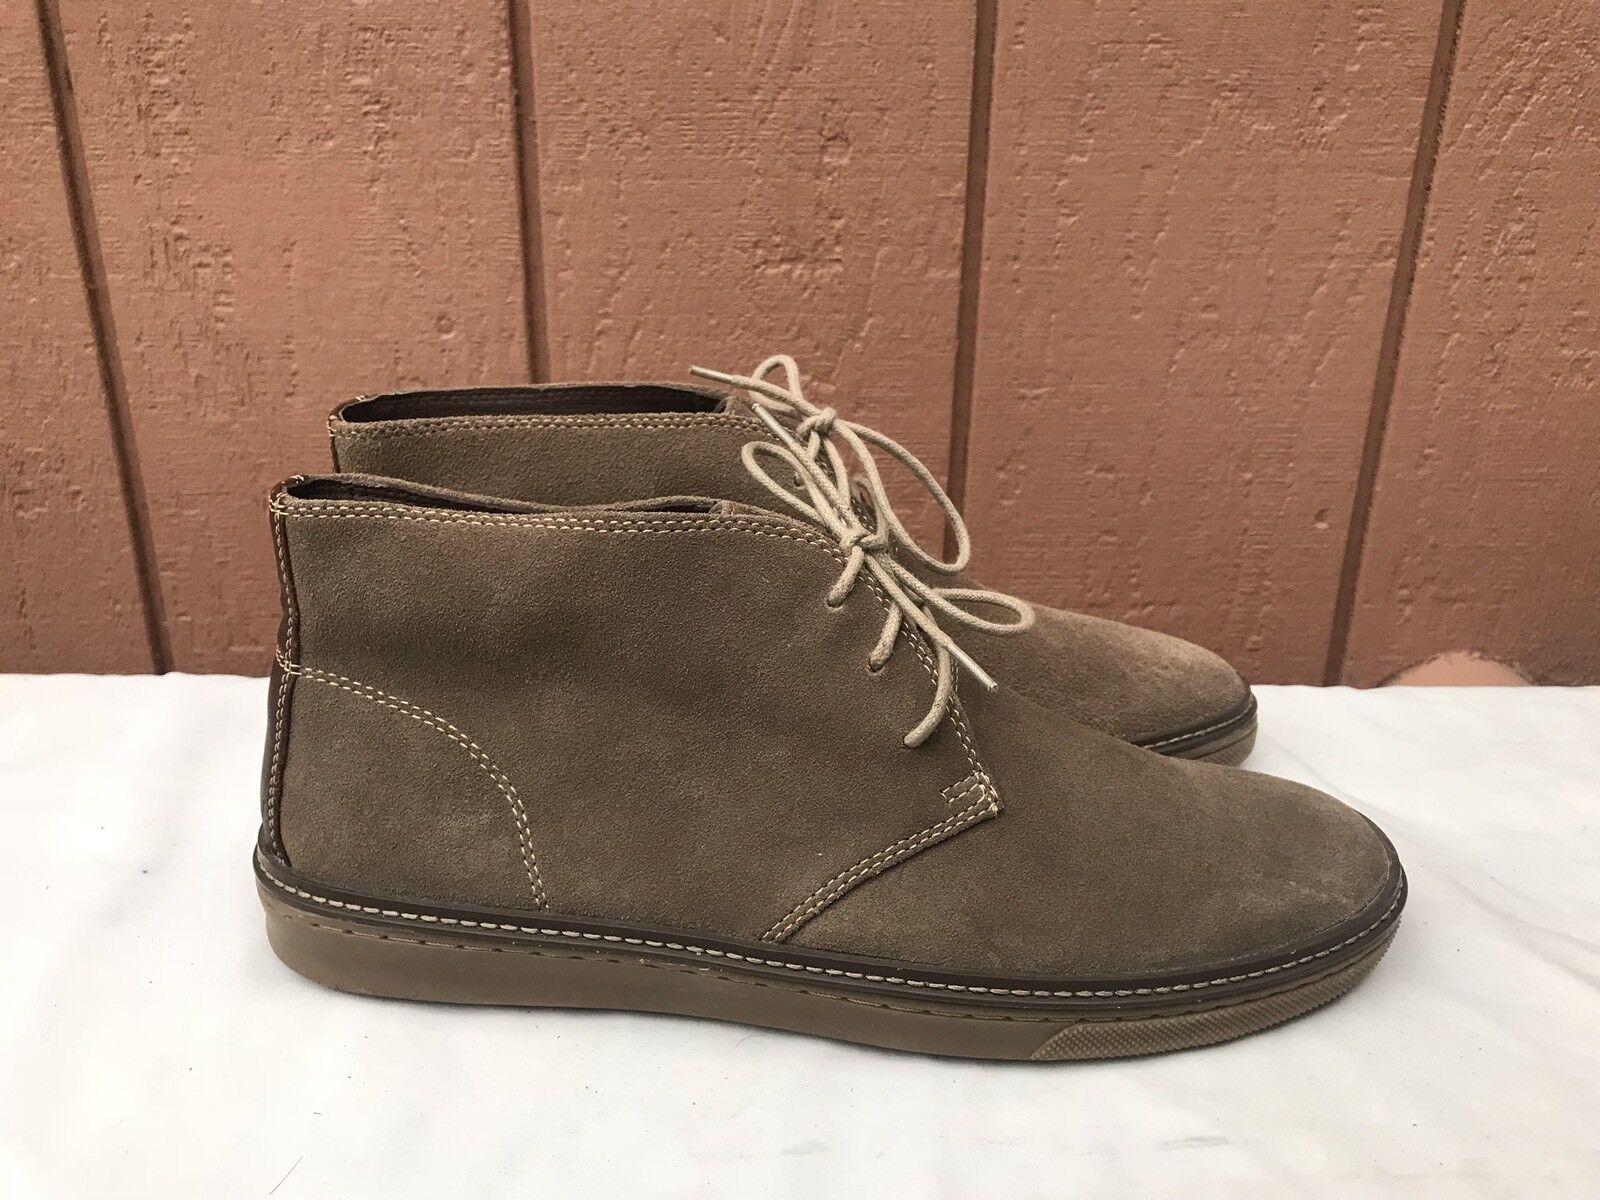 EUC Johnston & Murphy Men's Size US 11M Brown Suede Ankle Boots Lace Up